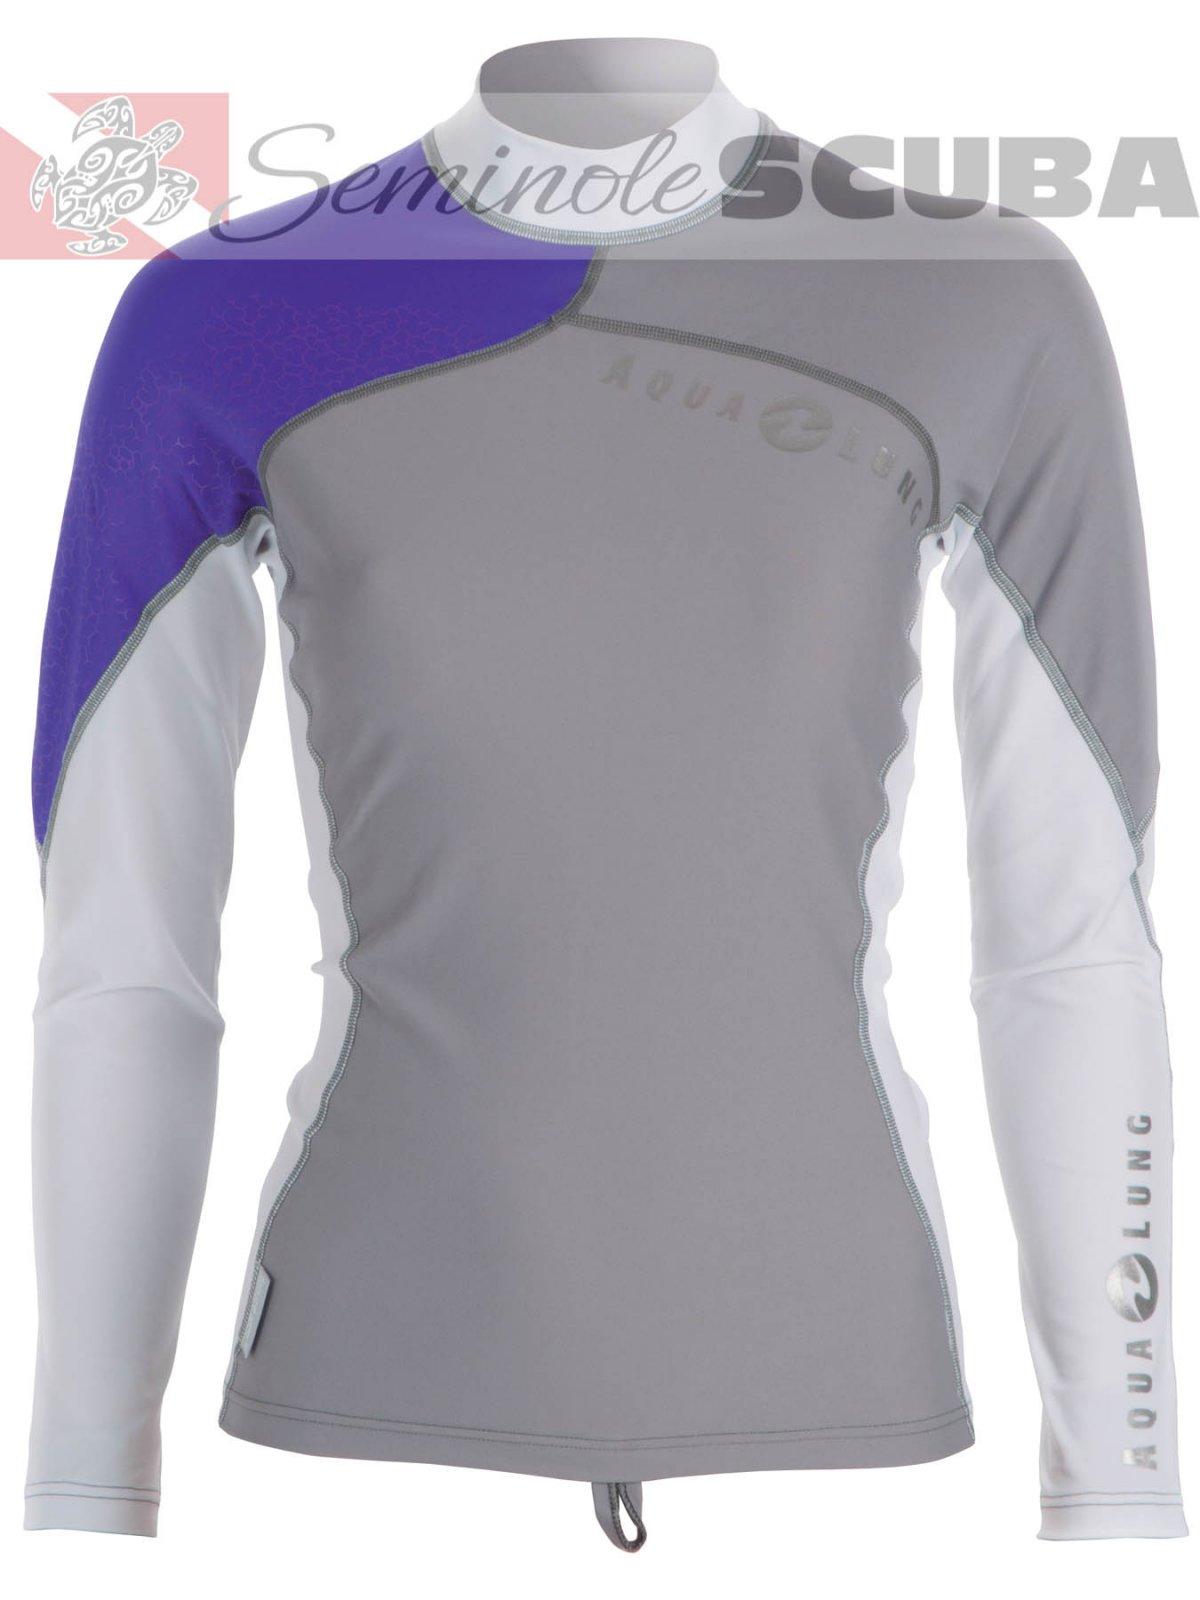 Aqua Lung Women's L/S Athletic Fit Rashguard